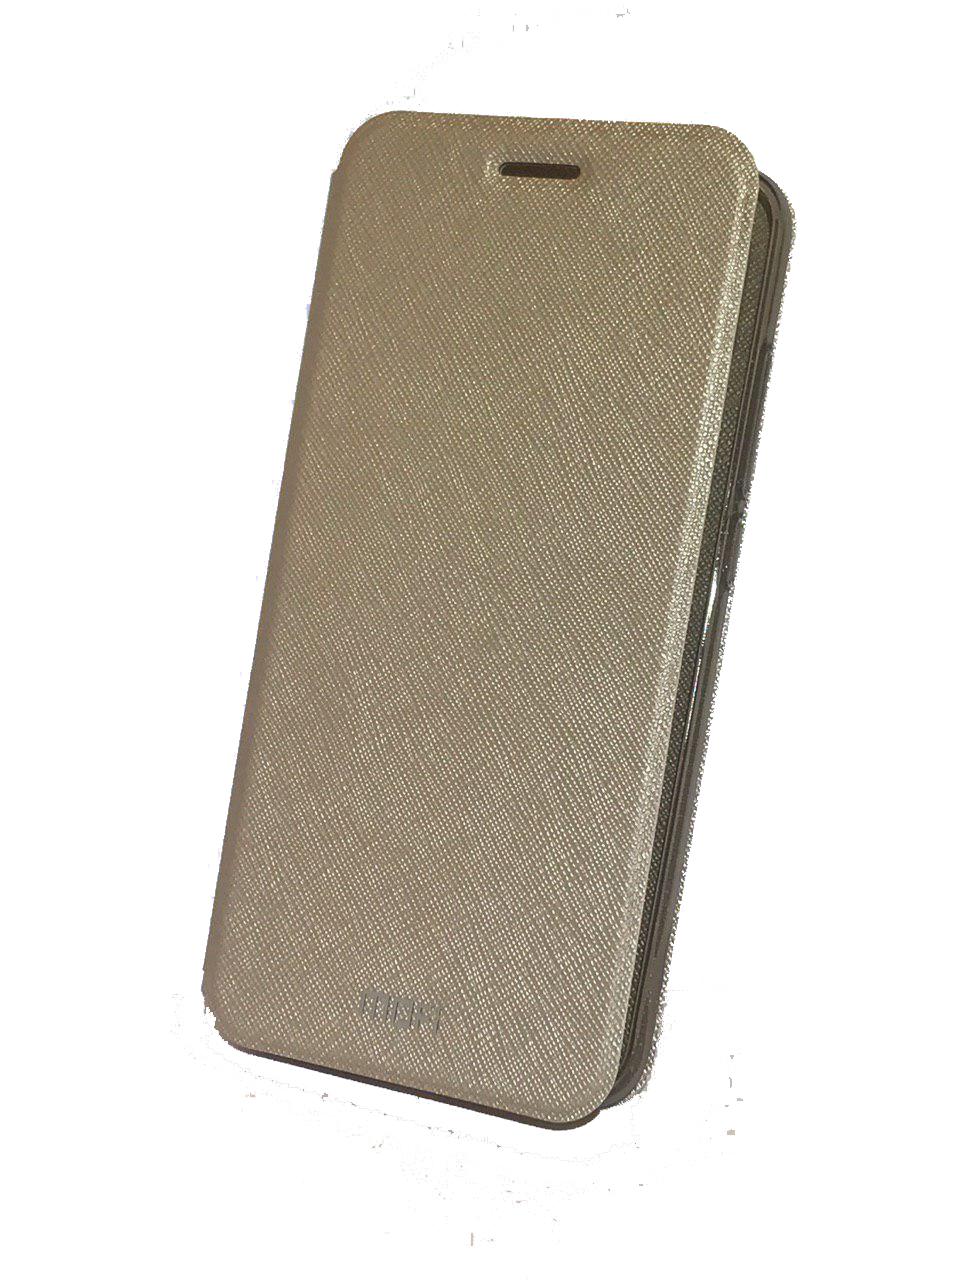 Чехол для Xiaomi Redmi 4A Книжка Ribbed Xiaomi Redmi 4A Gold leather case colorful flip cover for xiaomi redmi 4a white